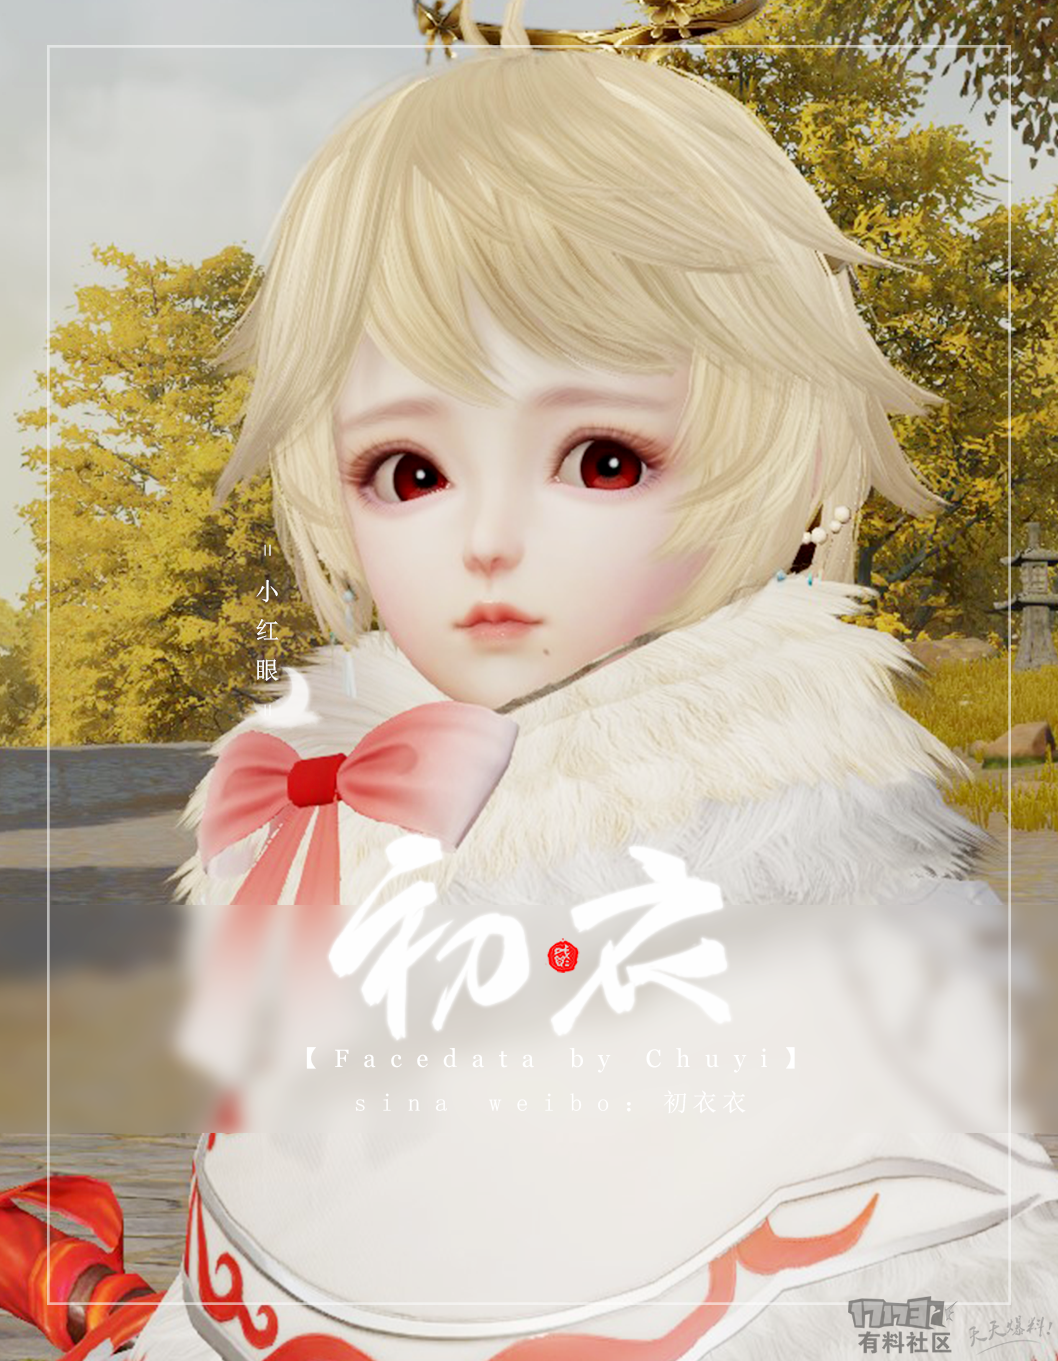 初衣-小红眼1.png